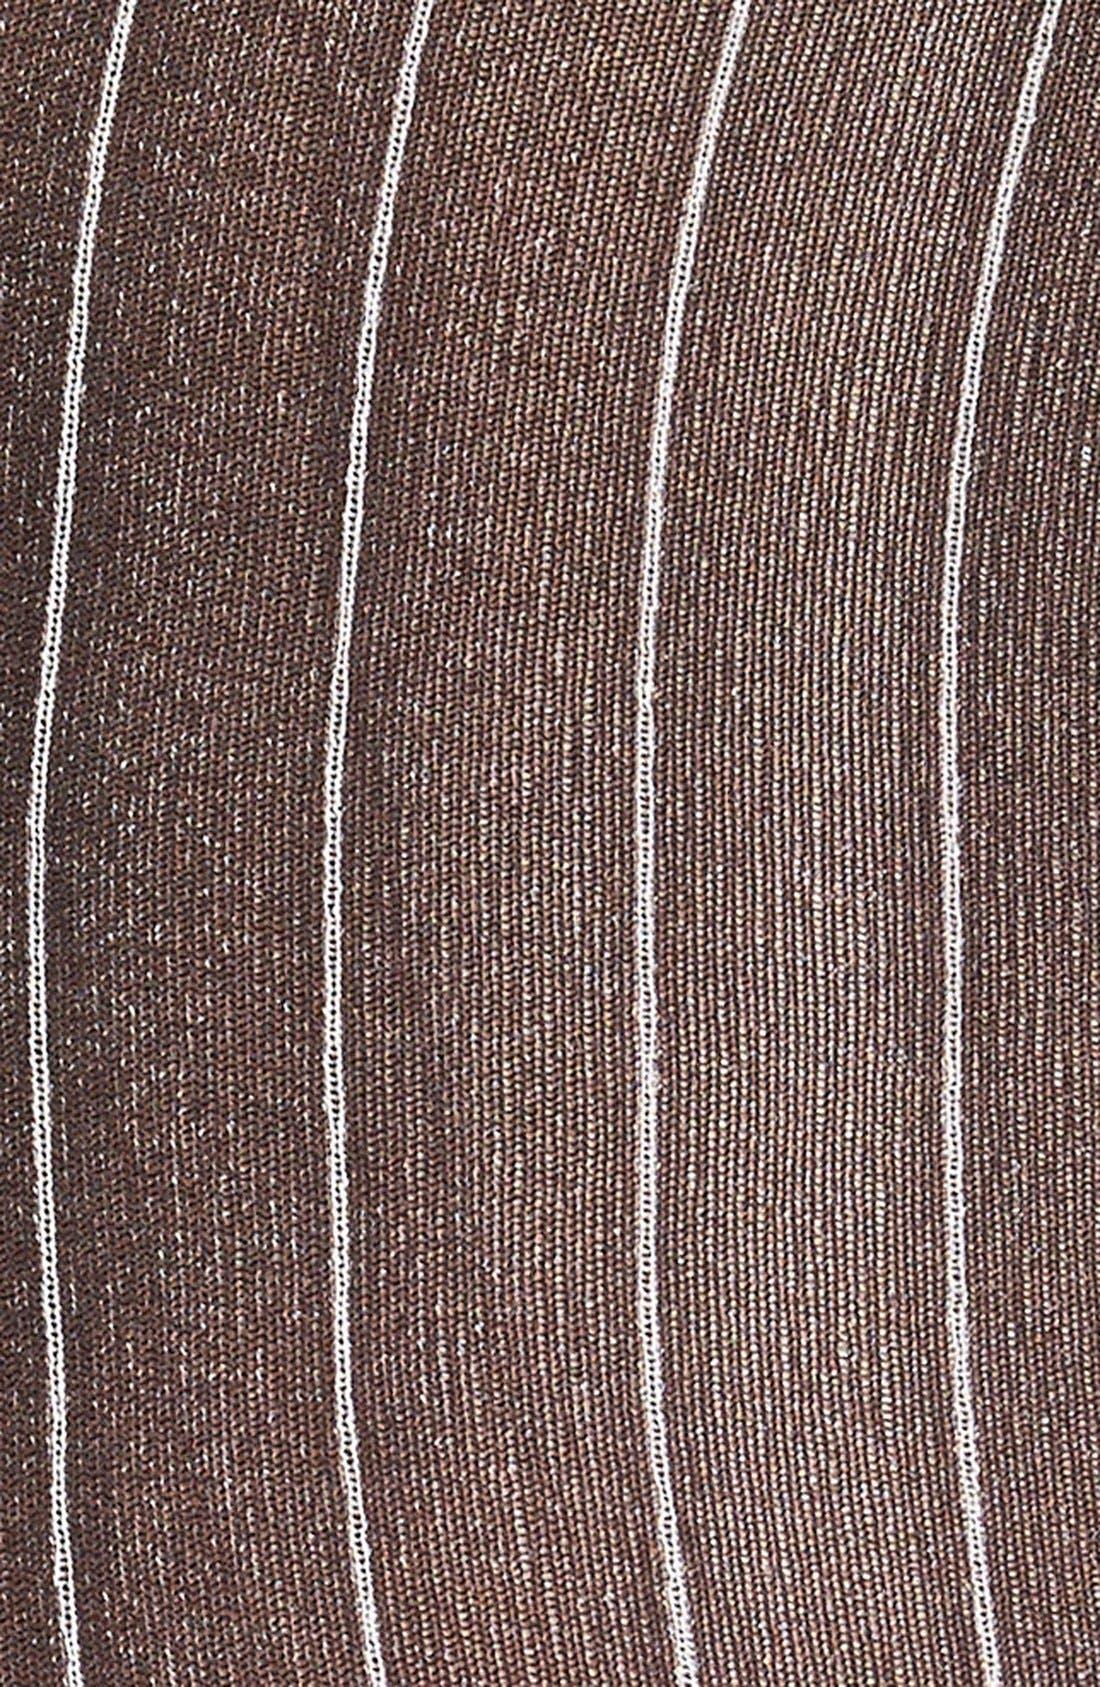 Alternate Image 2  - Oroblu Pinstripe Tights